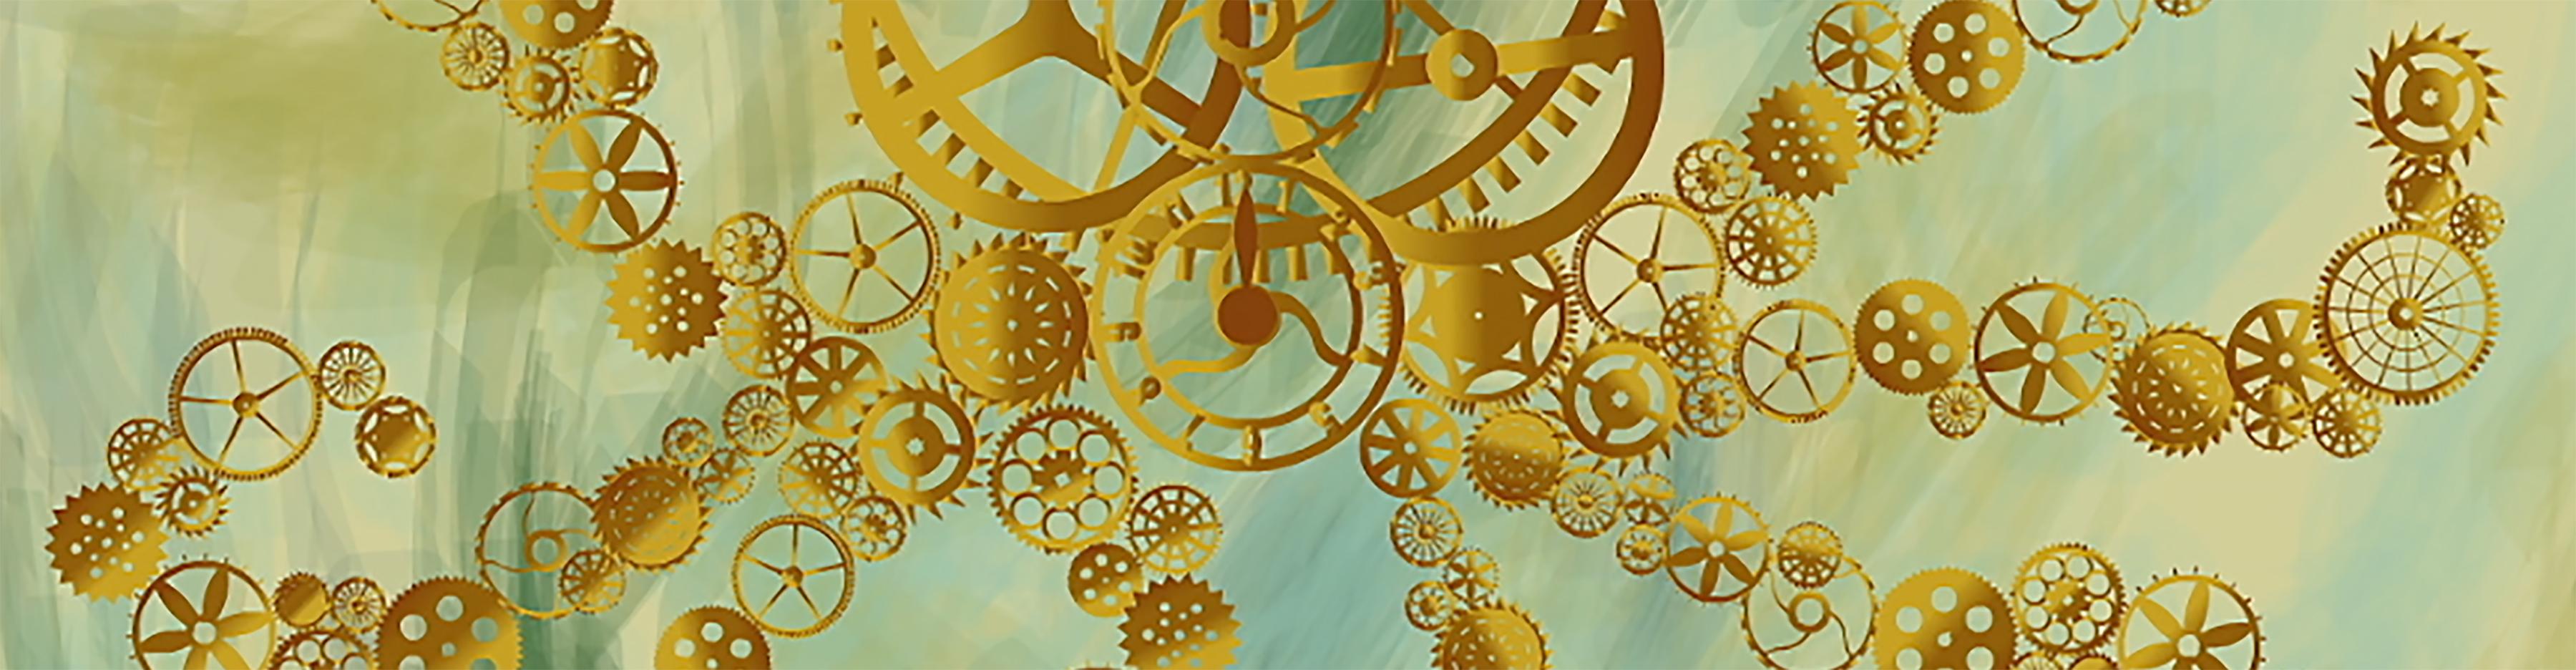 Bee-Original Design, Design, Animation, Explainer video Cape Town, webdesign